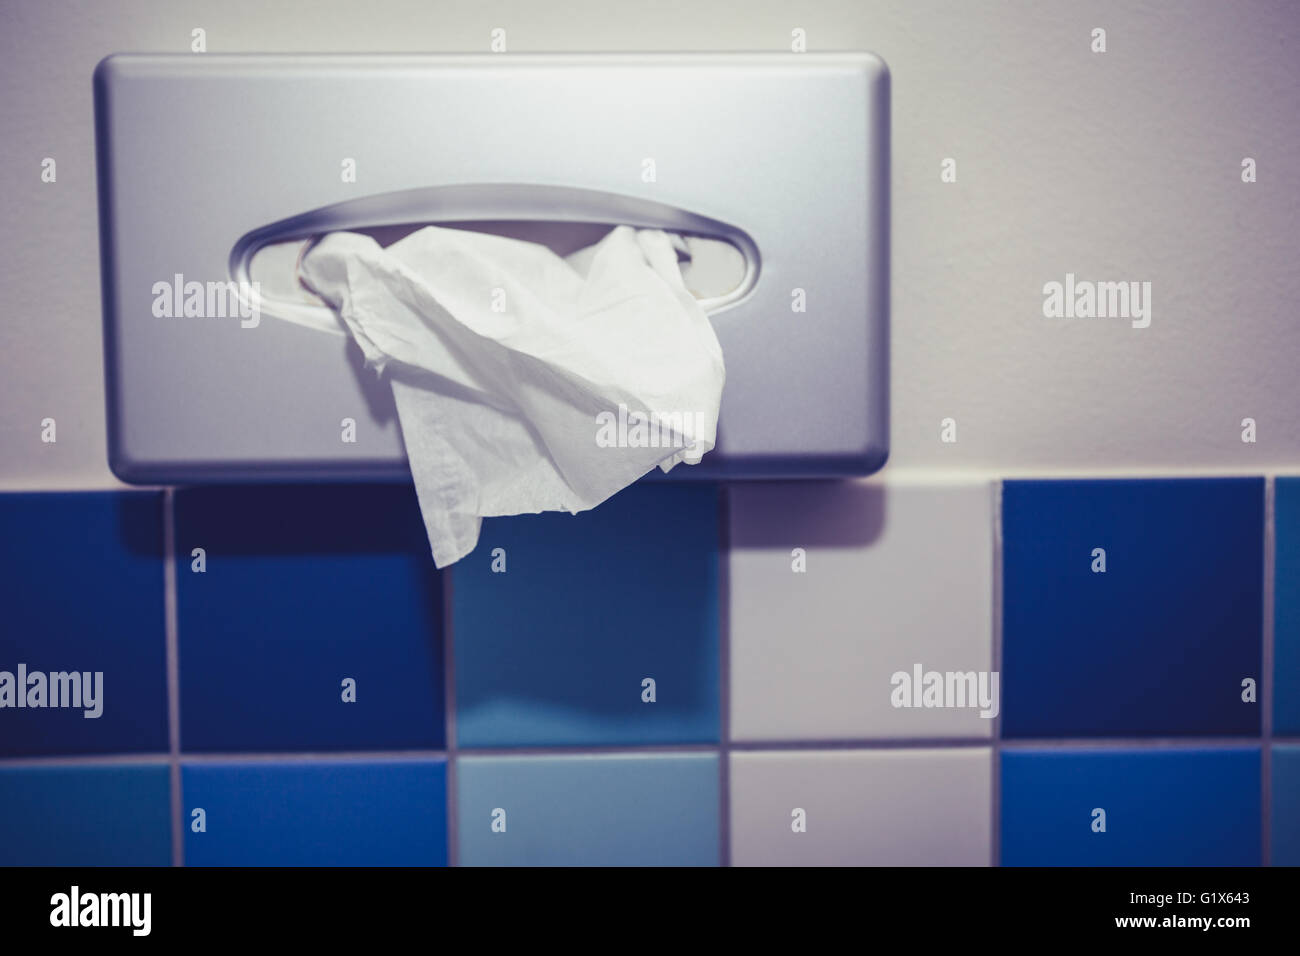 Bathroom Tissue Stock Photos & Bathroom Tissue Stock Images - Alamy